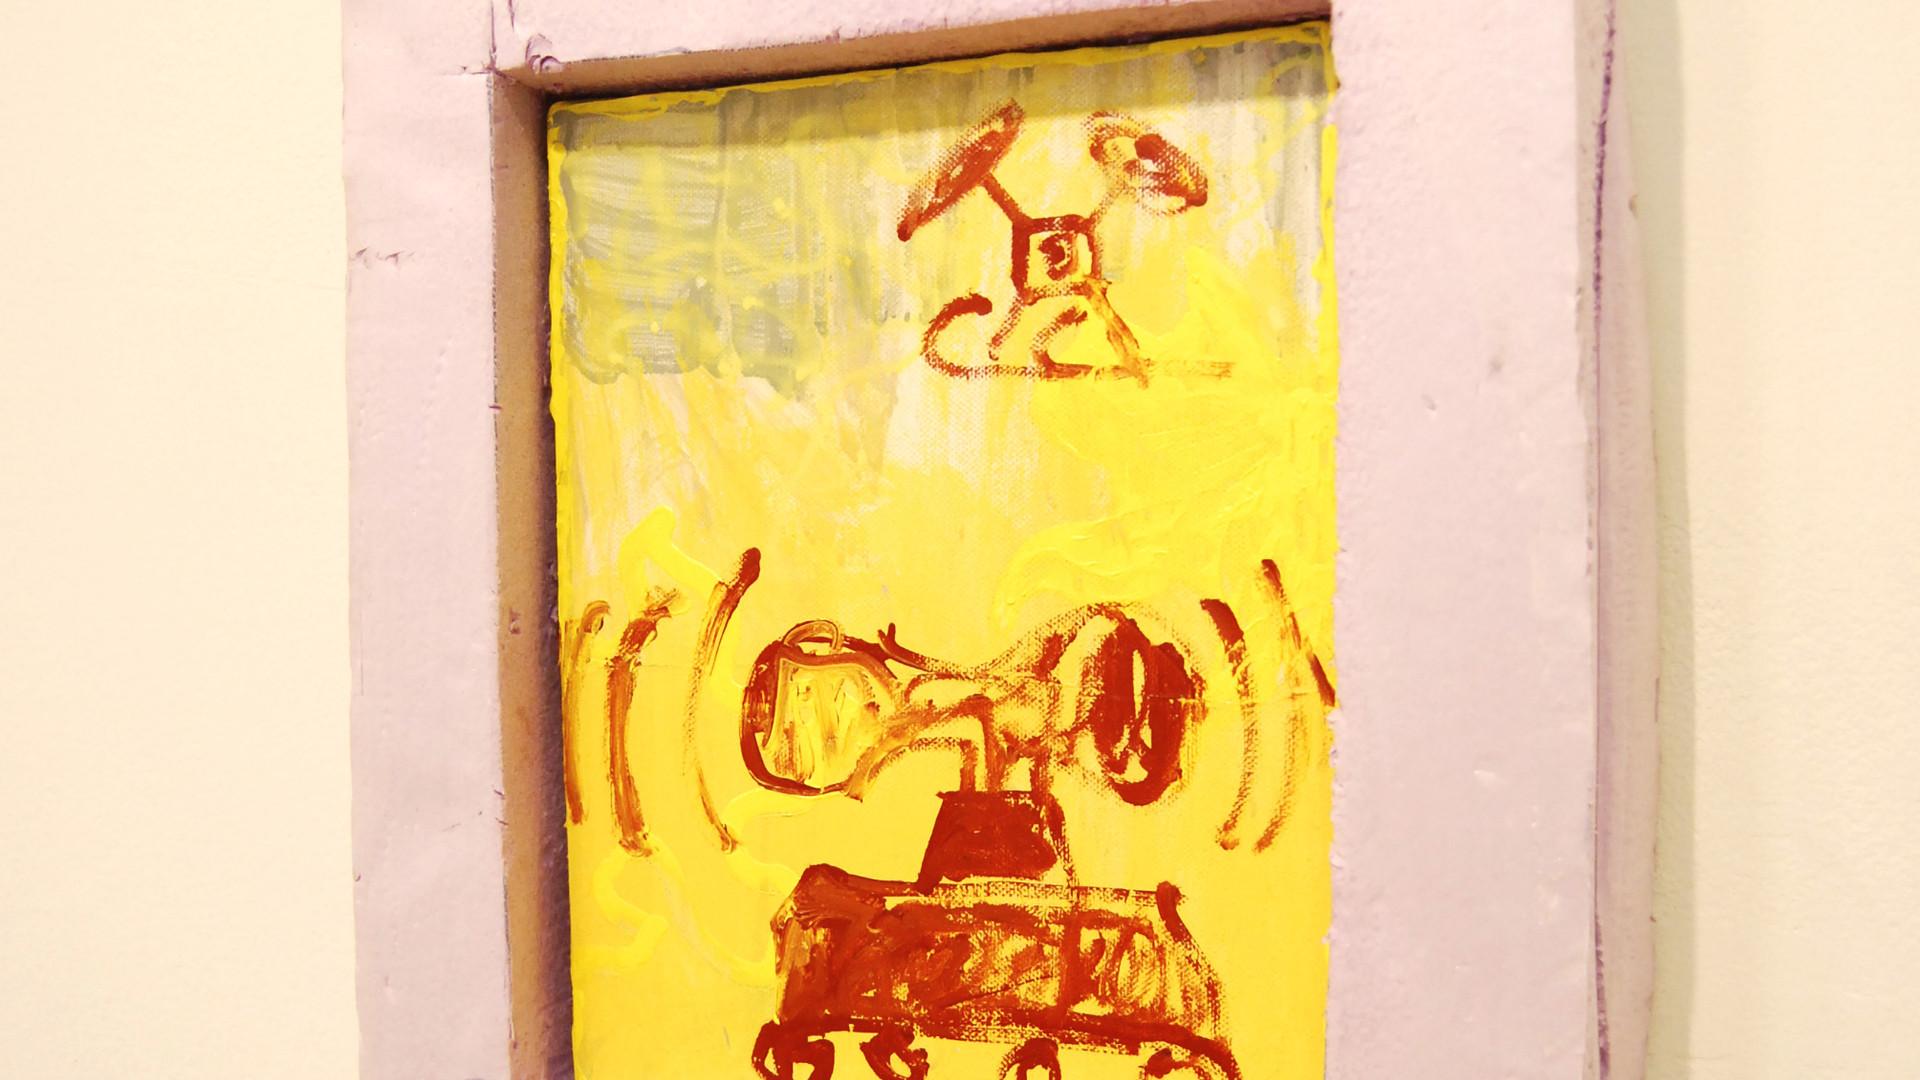 O.T. / 2019 / 30x24cm (ohne Rahmen) / Acryl,Lack auf Leinwand  ---   Magische Dystopie / mit Sophia Leitenmayer, Conrad Hübbe / MOM ART SPACE / Hamburg 2019 / Kuratiert von Jessica Herden, Pascal Brinkmann